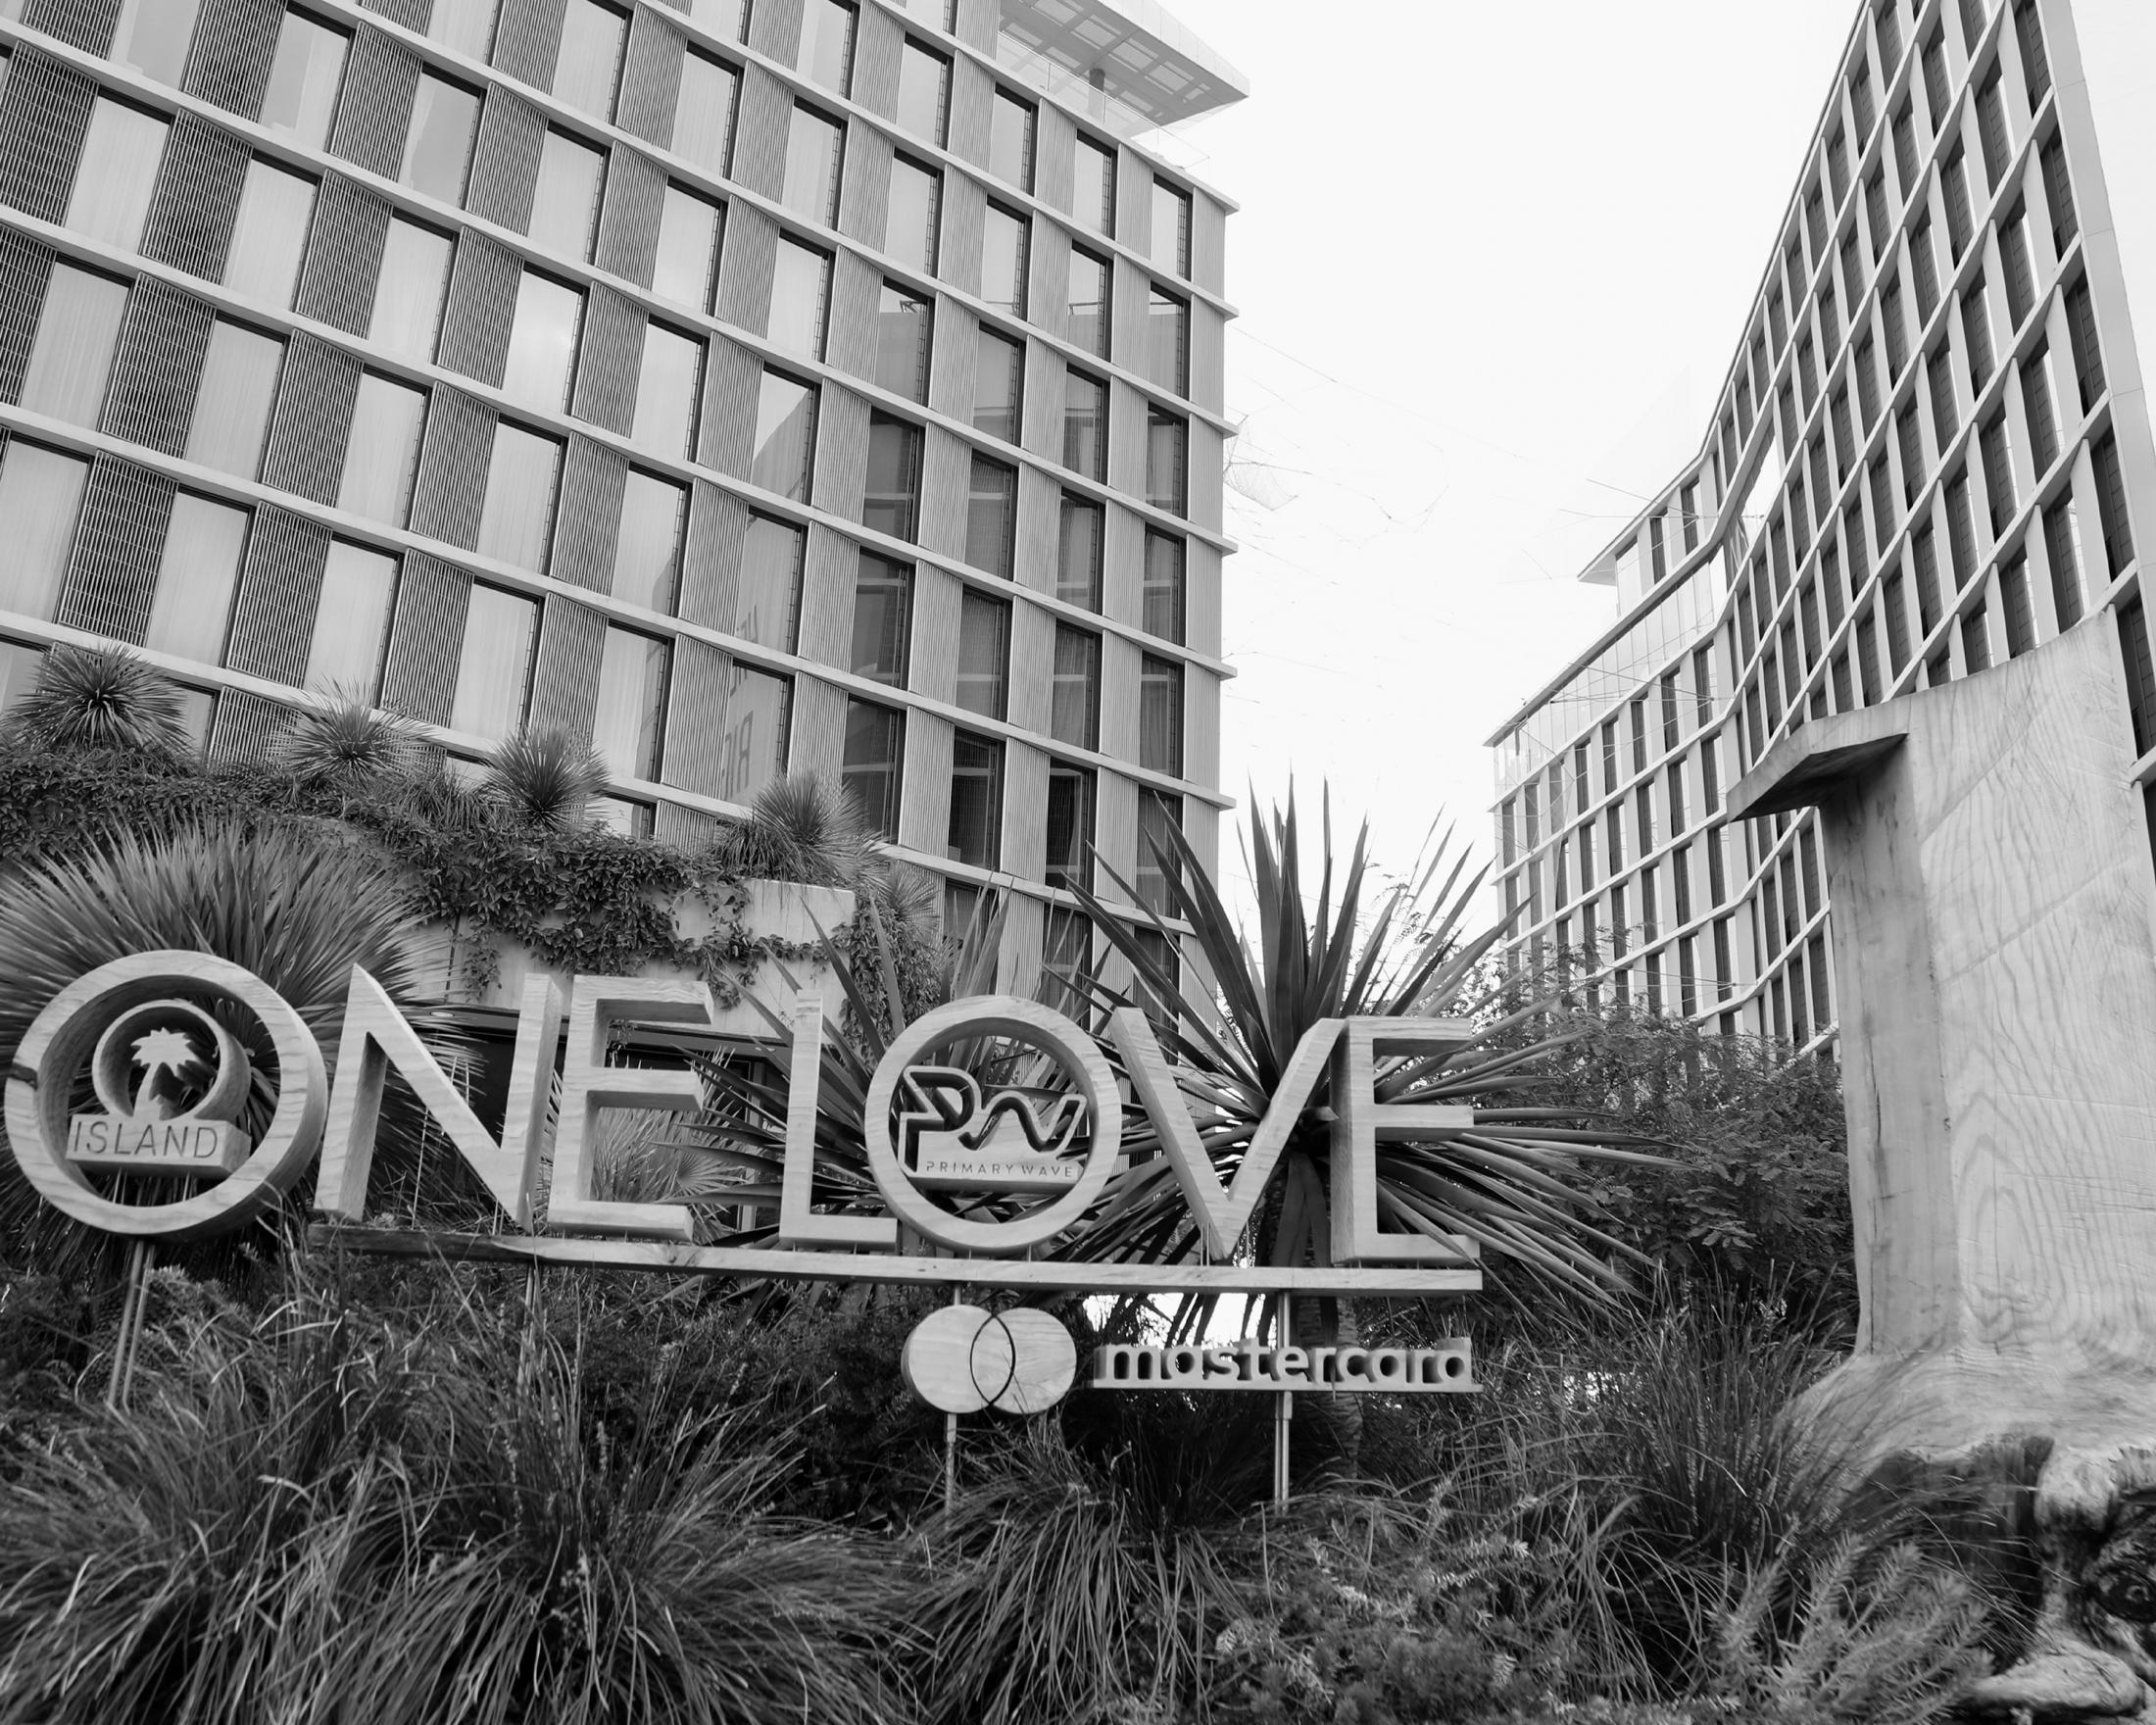 Thumbnail for Bob Marley 75 Pre-Grammy Week: One Love Hotel